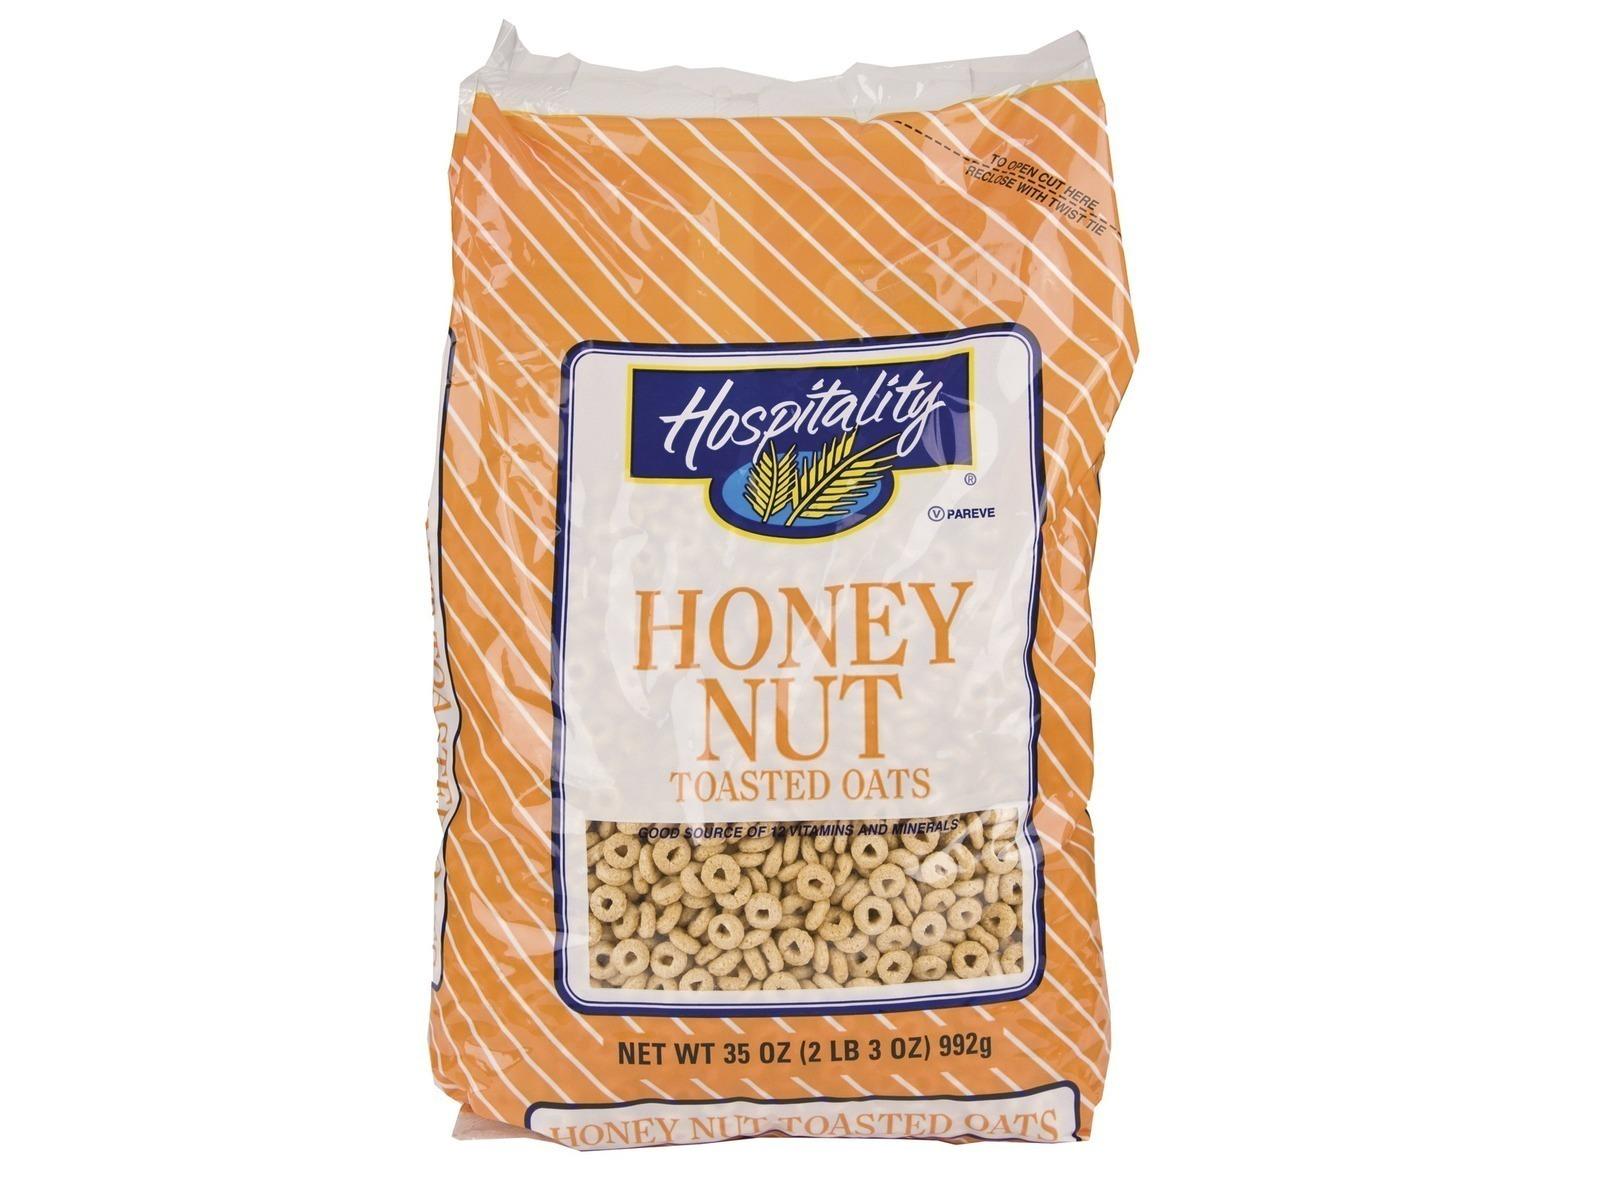 Honey Nut Toasted Oats